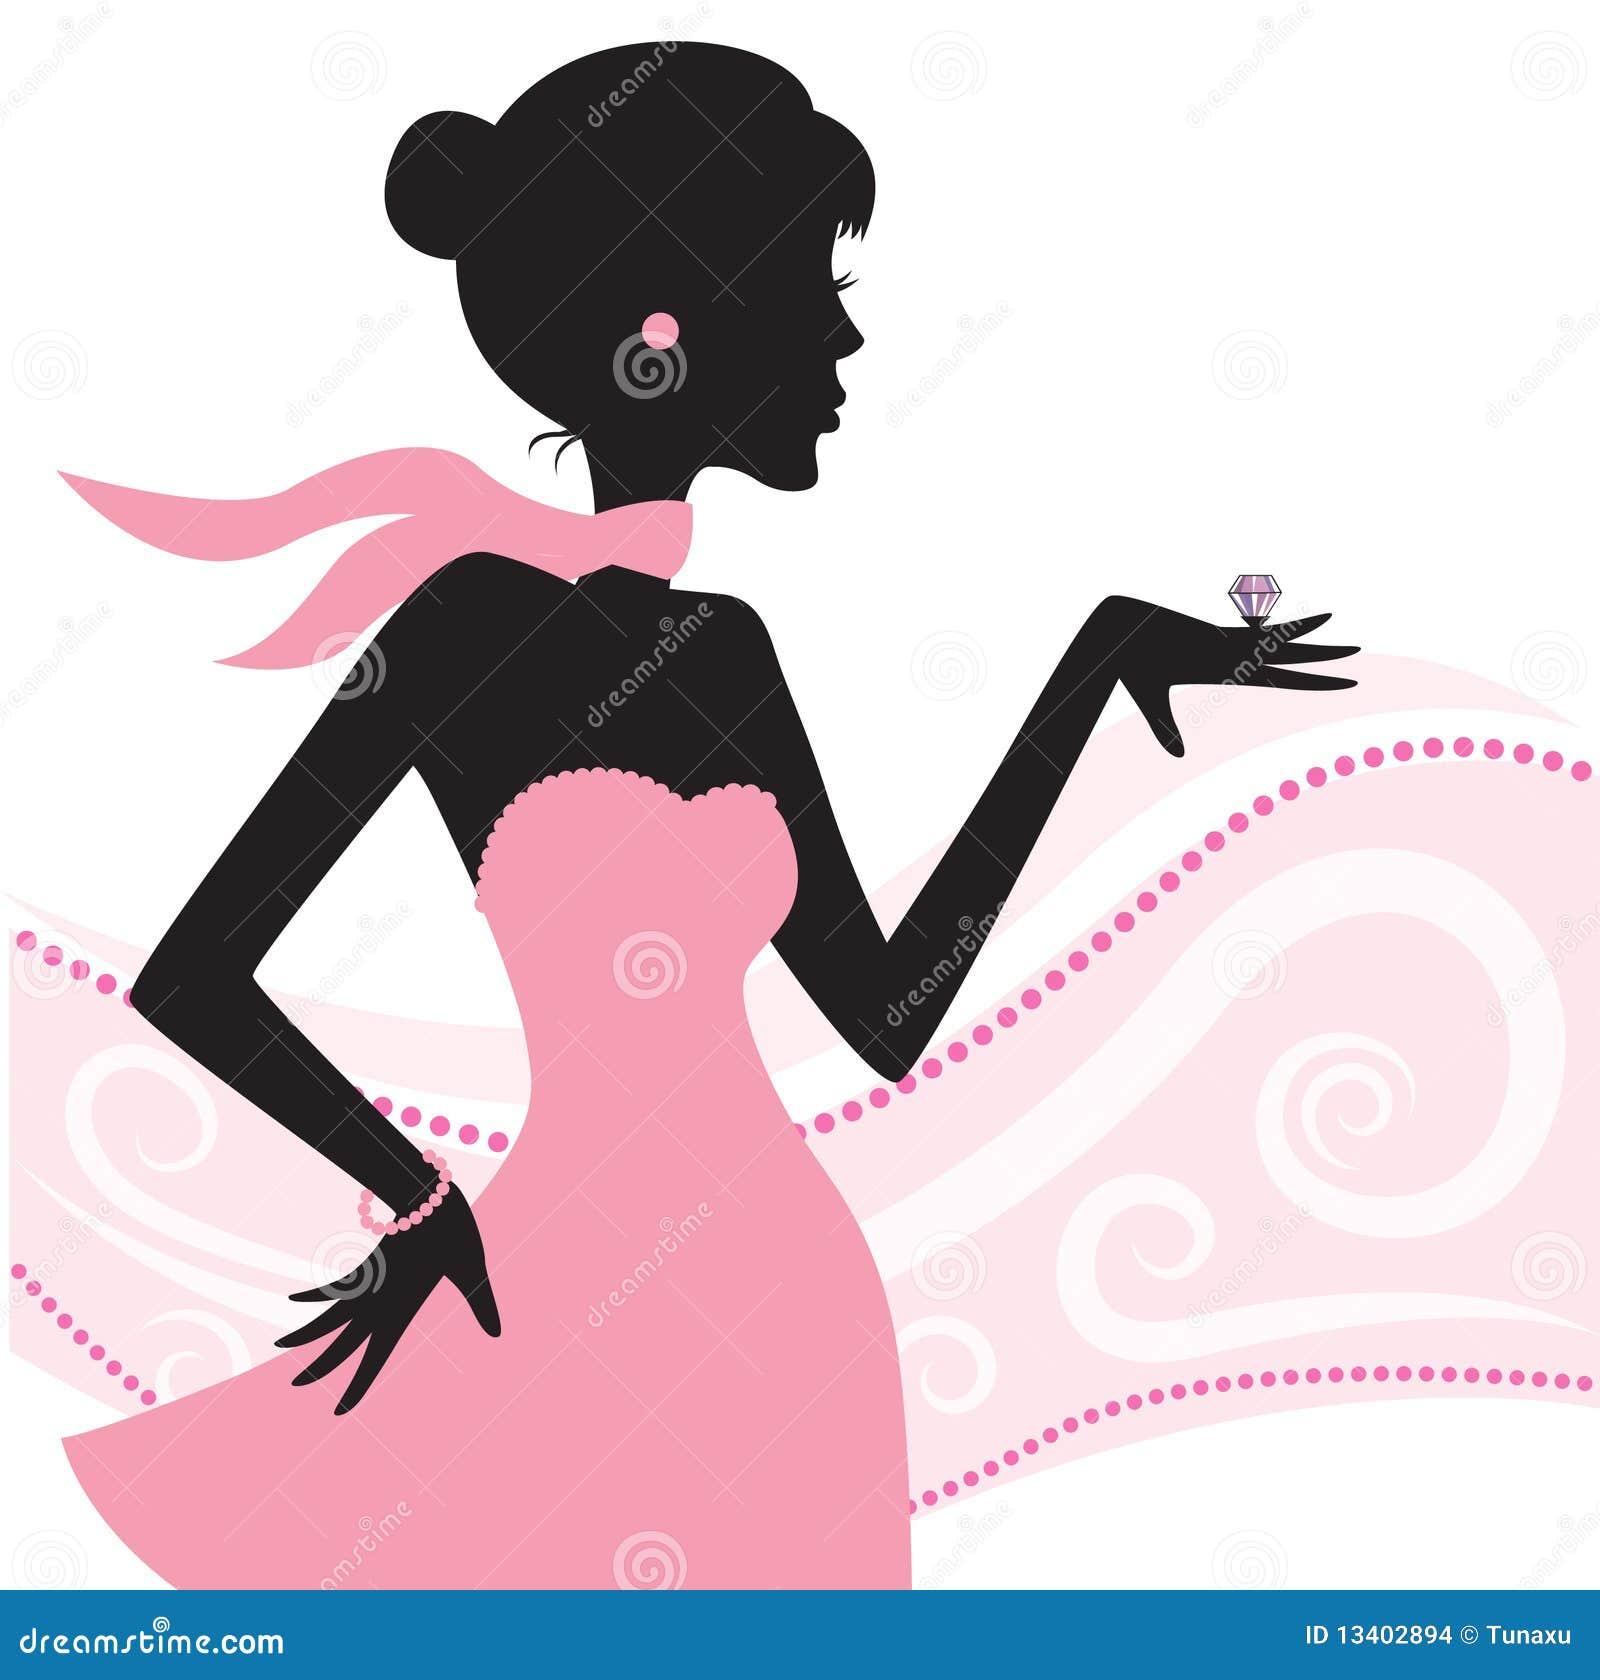 Mujeres con joyer a ilustraci n del vector ilustraci n de for Art premier